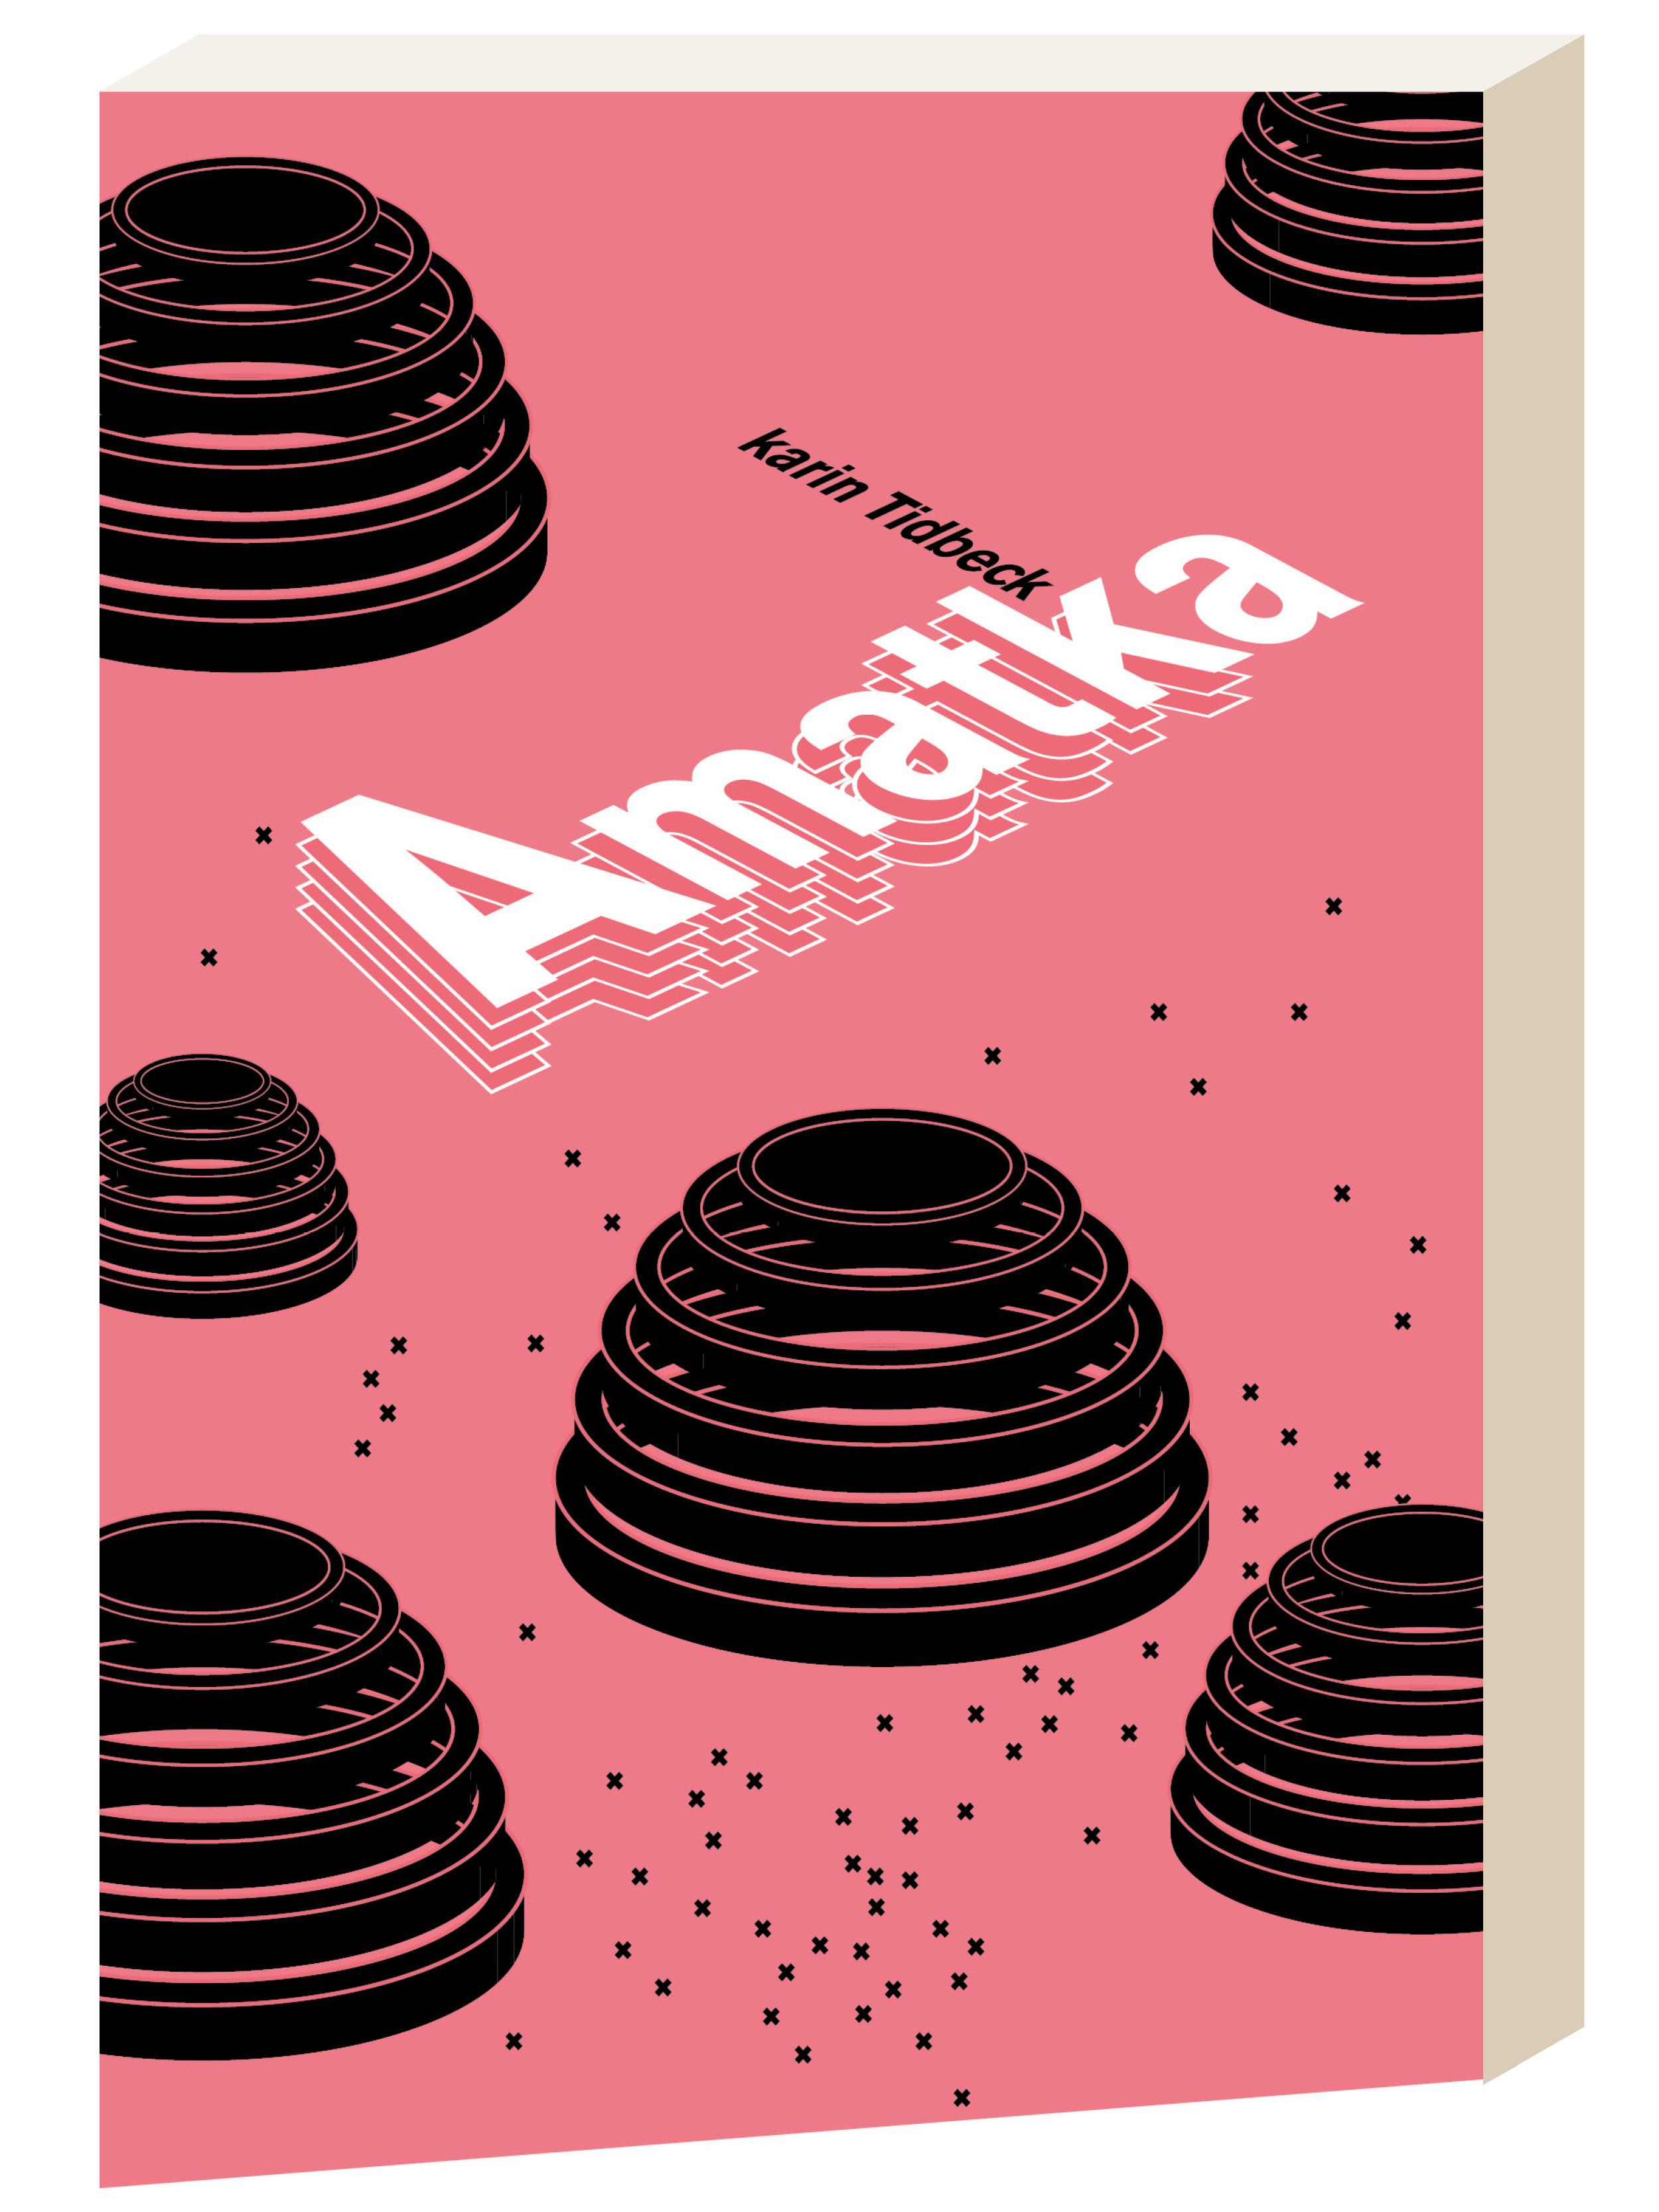 Amatka – Karin Tidbeck